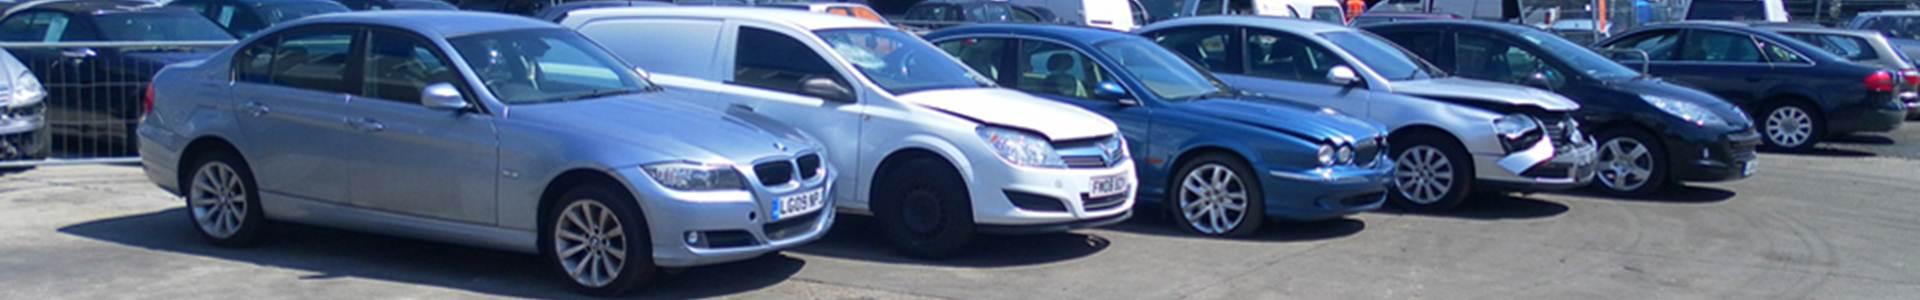 Junk Car Removal | Towing Masters Calgary Car Towing Company